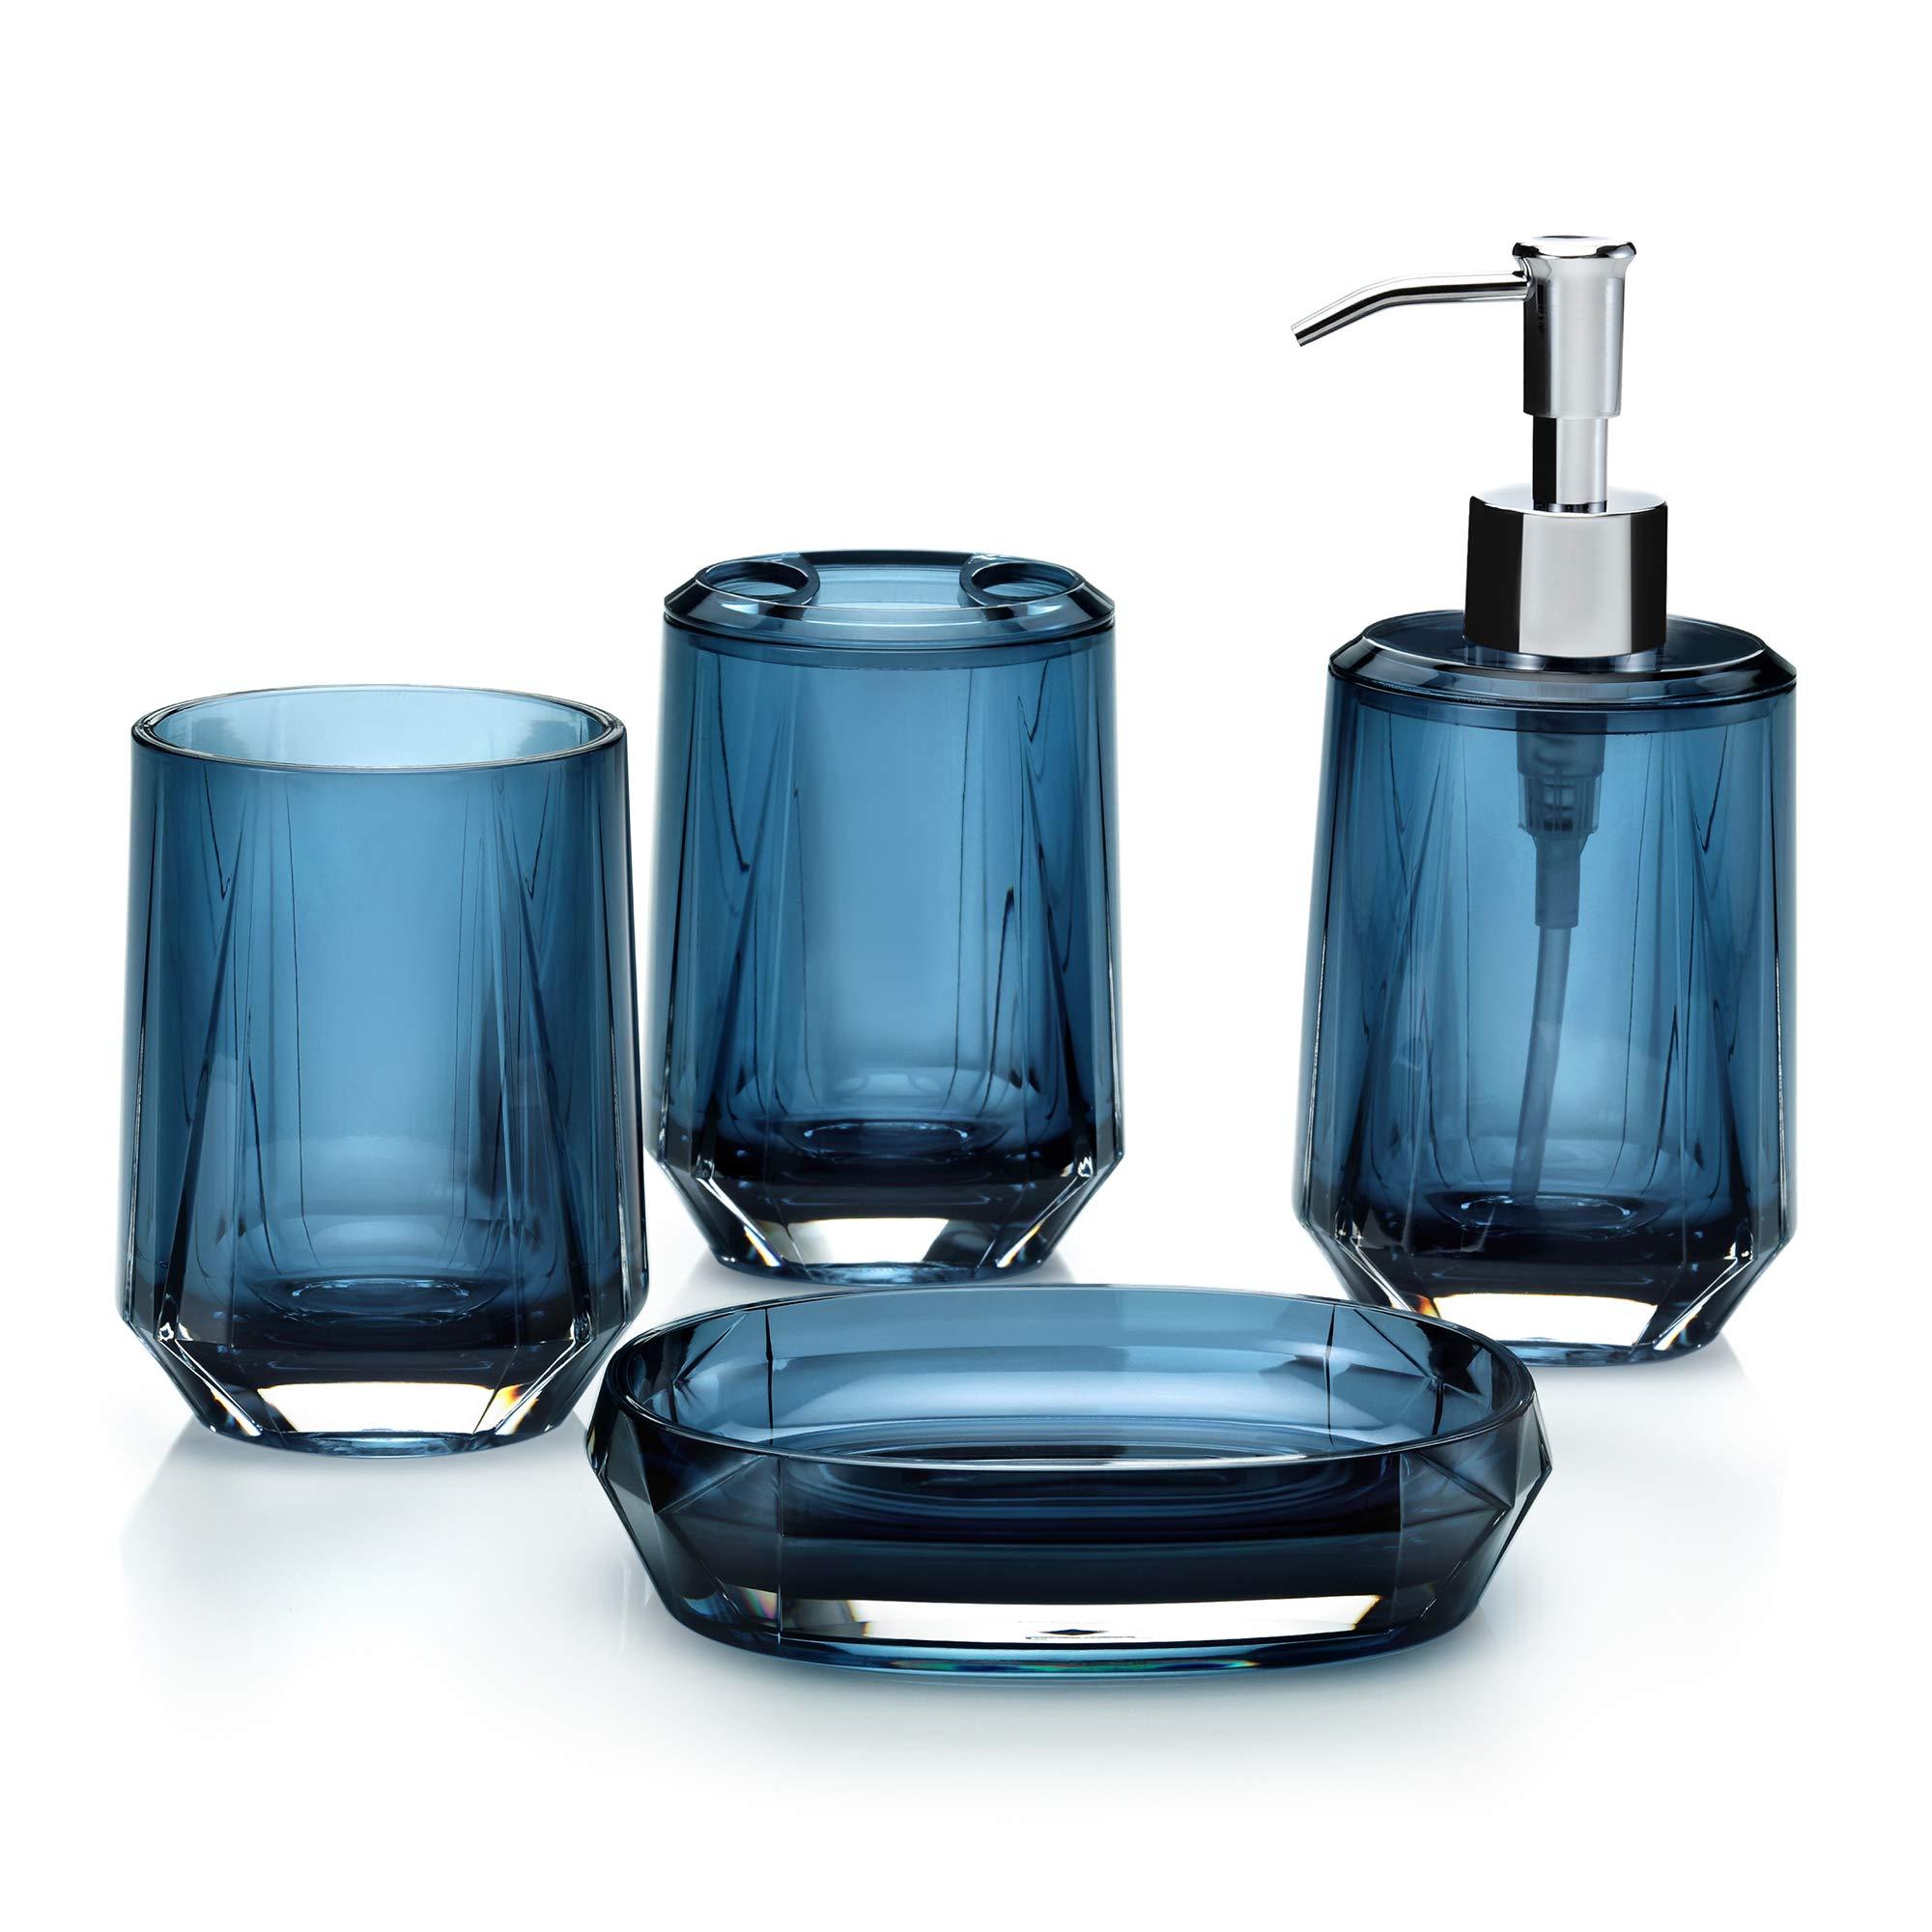 IMMANUEL Blink 4 Piece Bathroom Accessory Set - Blue